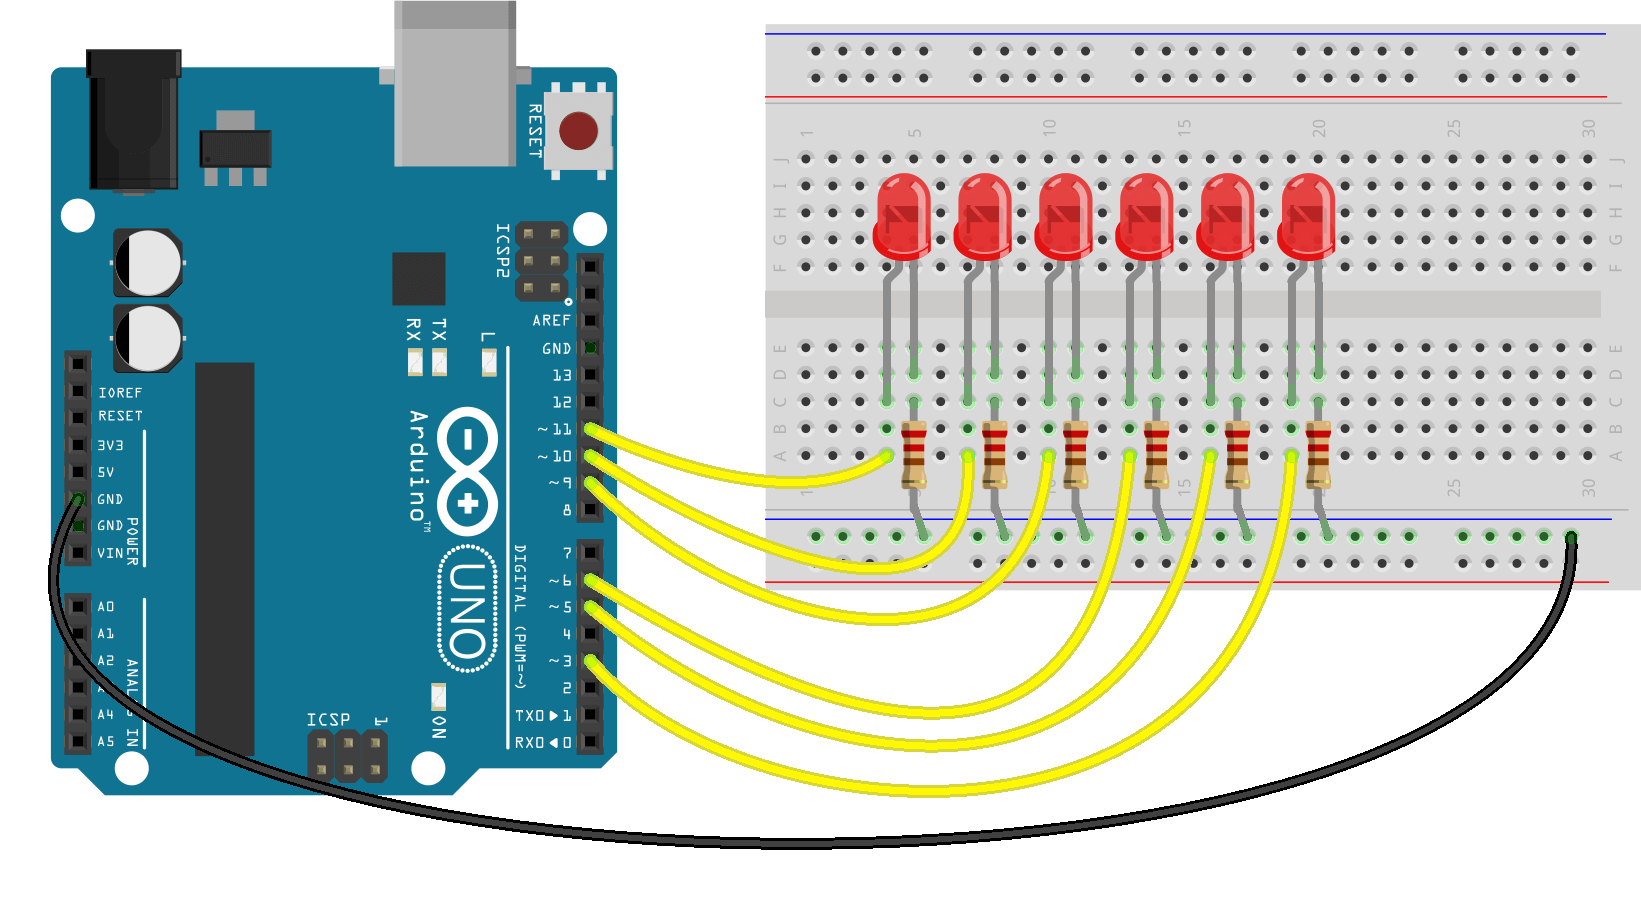 برنامه fade call back در جاوا اسکریپت روی آردوینو Arduino Johnny Five- دیجی اسپارک